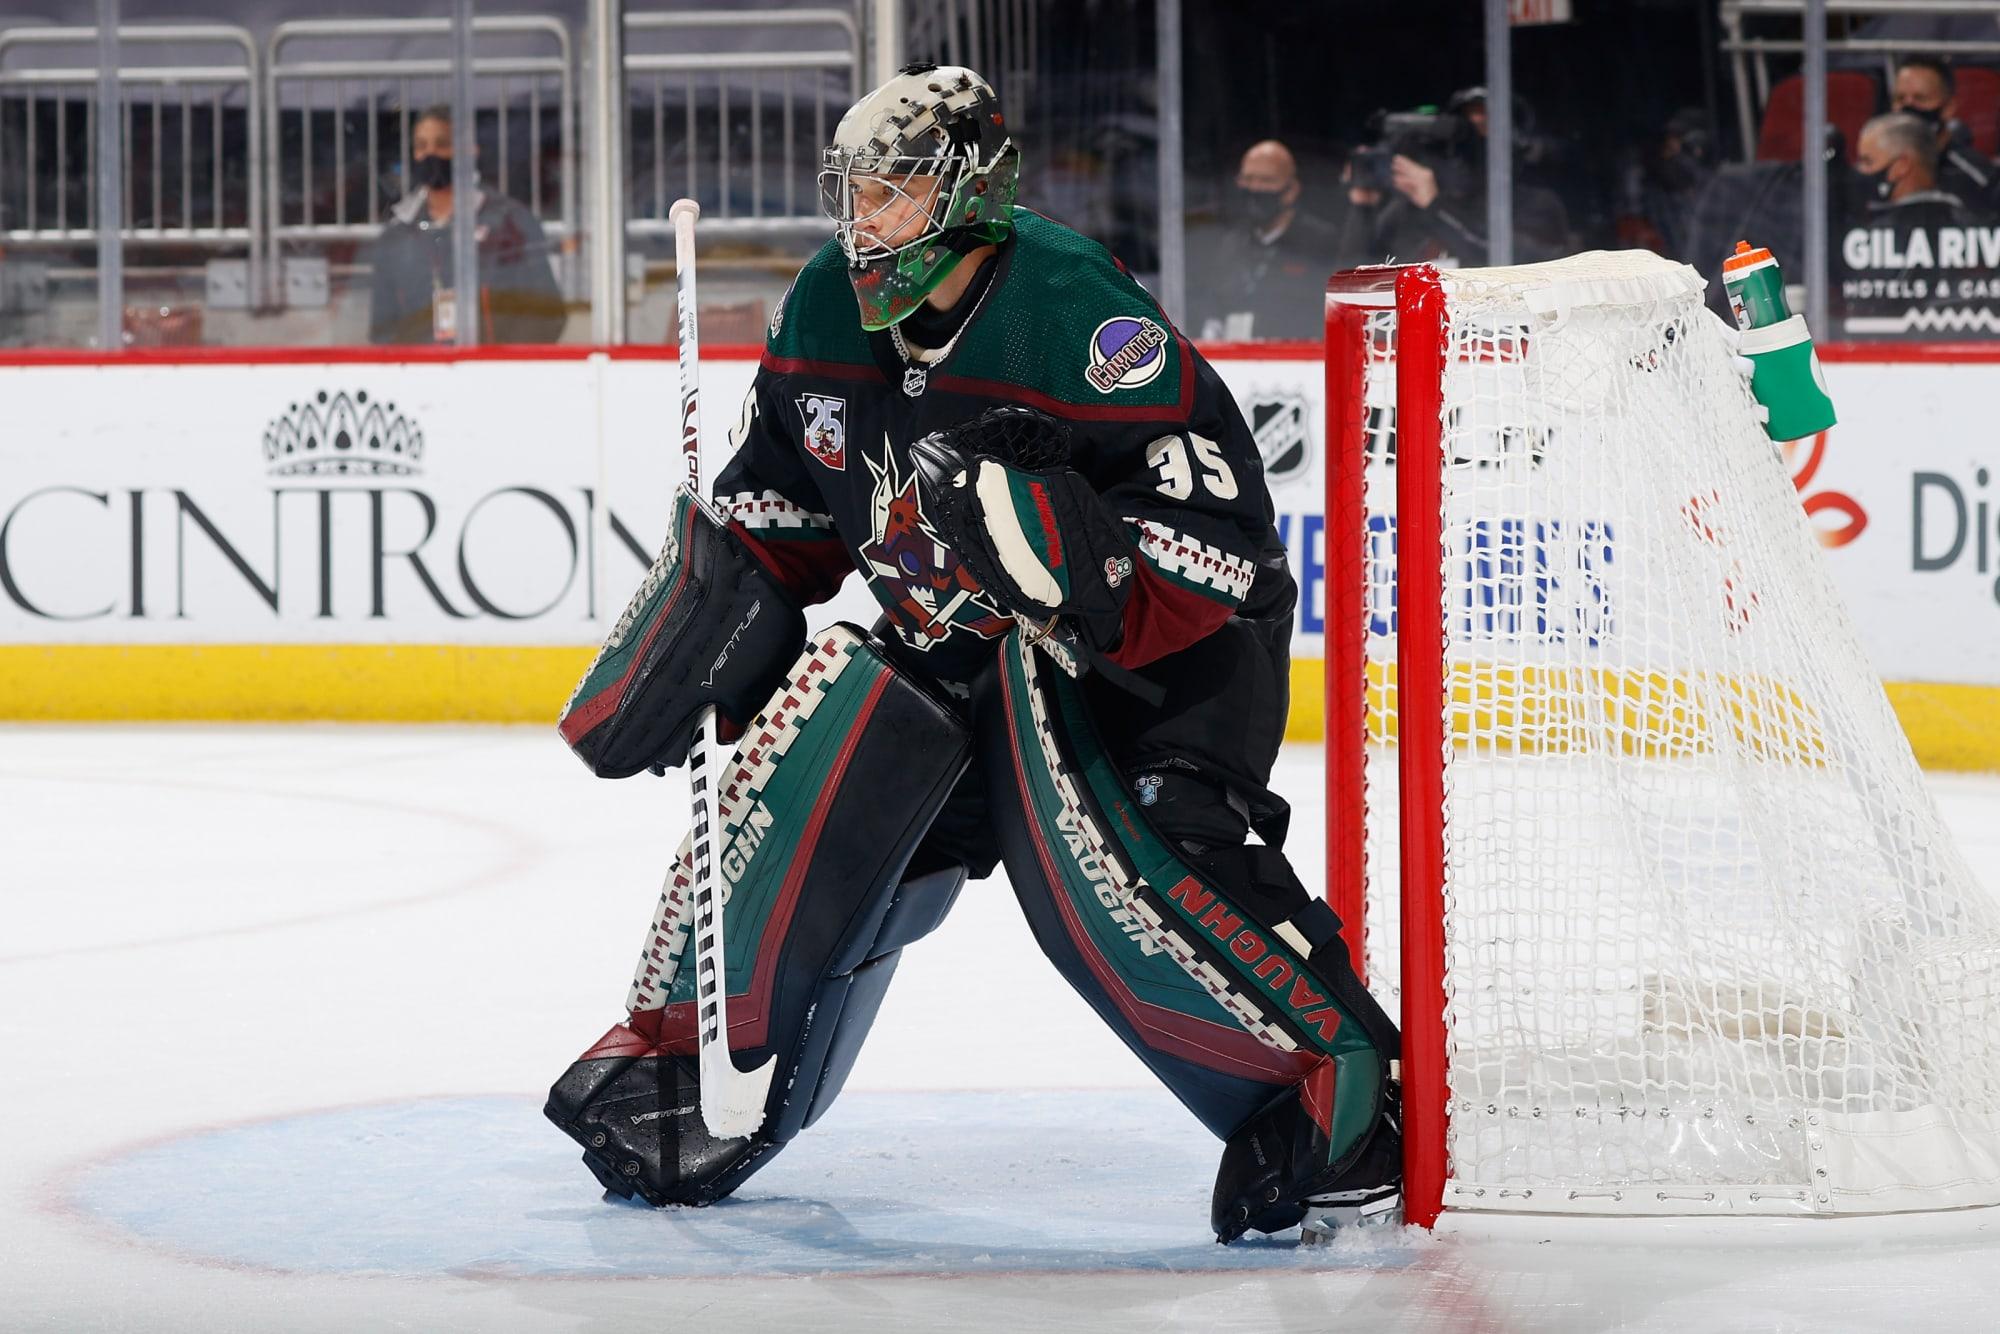 Toronto Maple Leafs Rumour Round Up: Kuemper, Landeskog and More